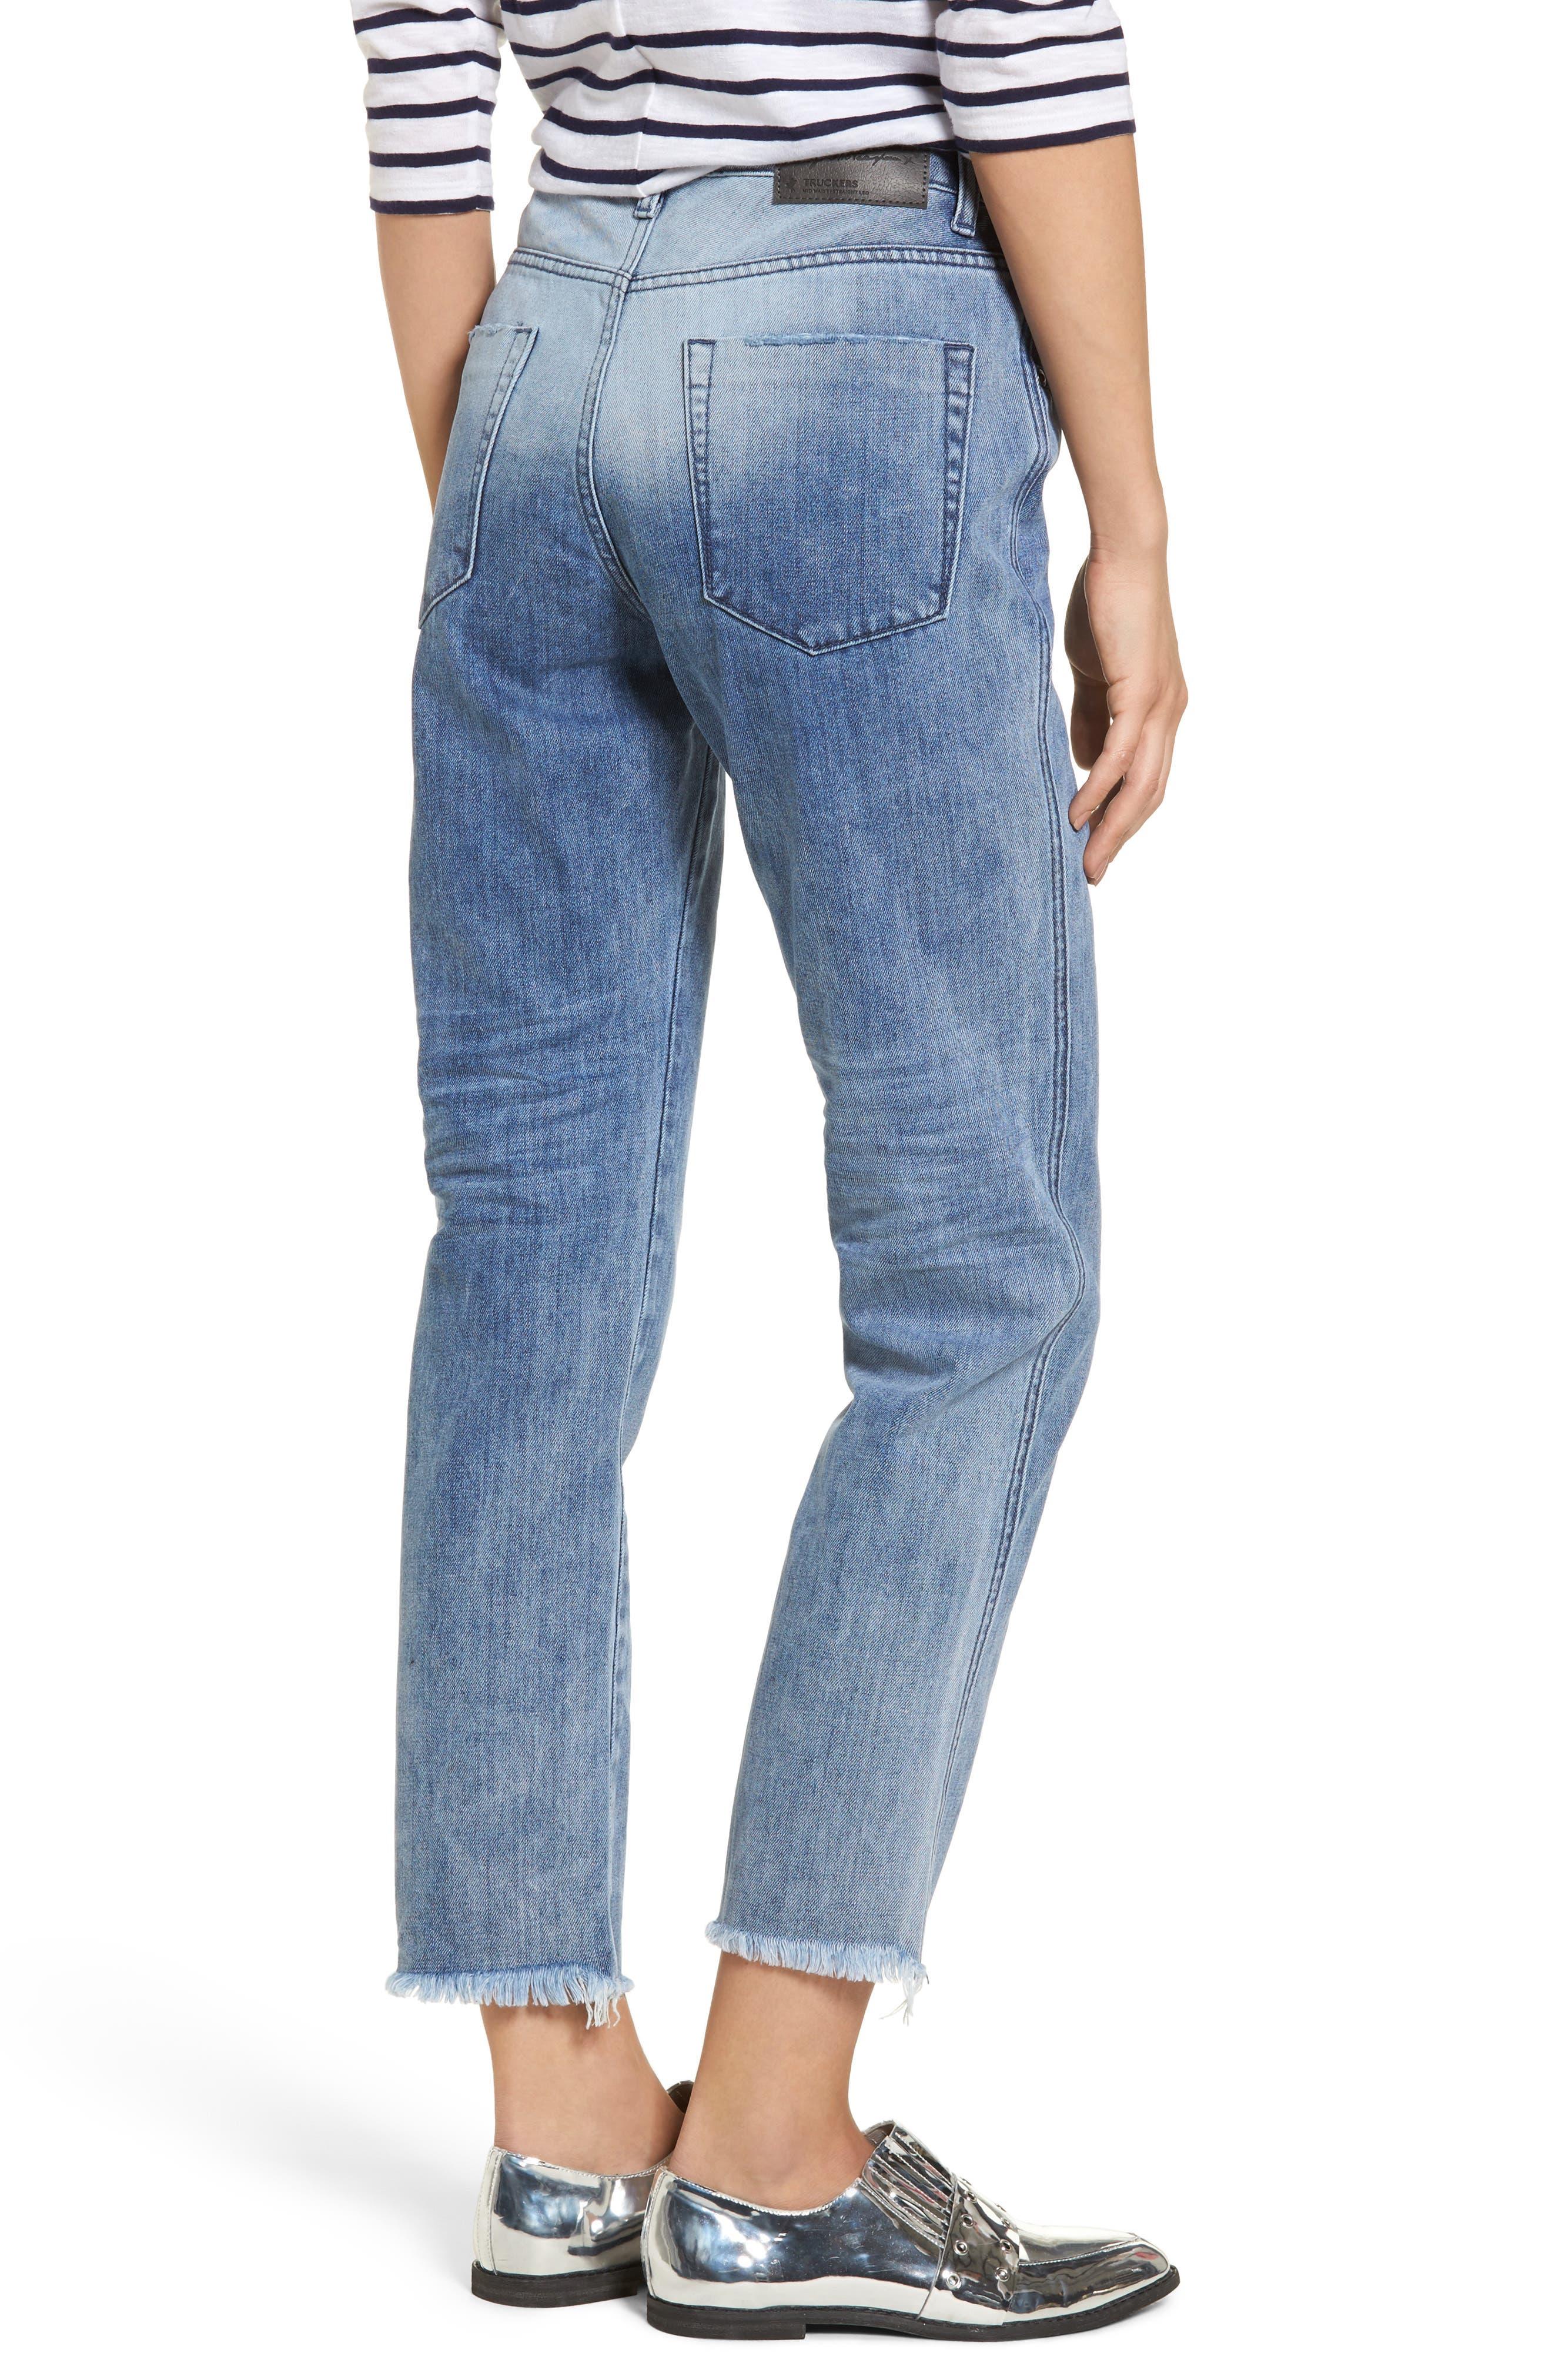 Tuckers High Waist Straight Leg Jeans,                             Alternate thumbnail 2, color,